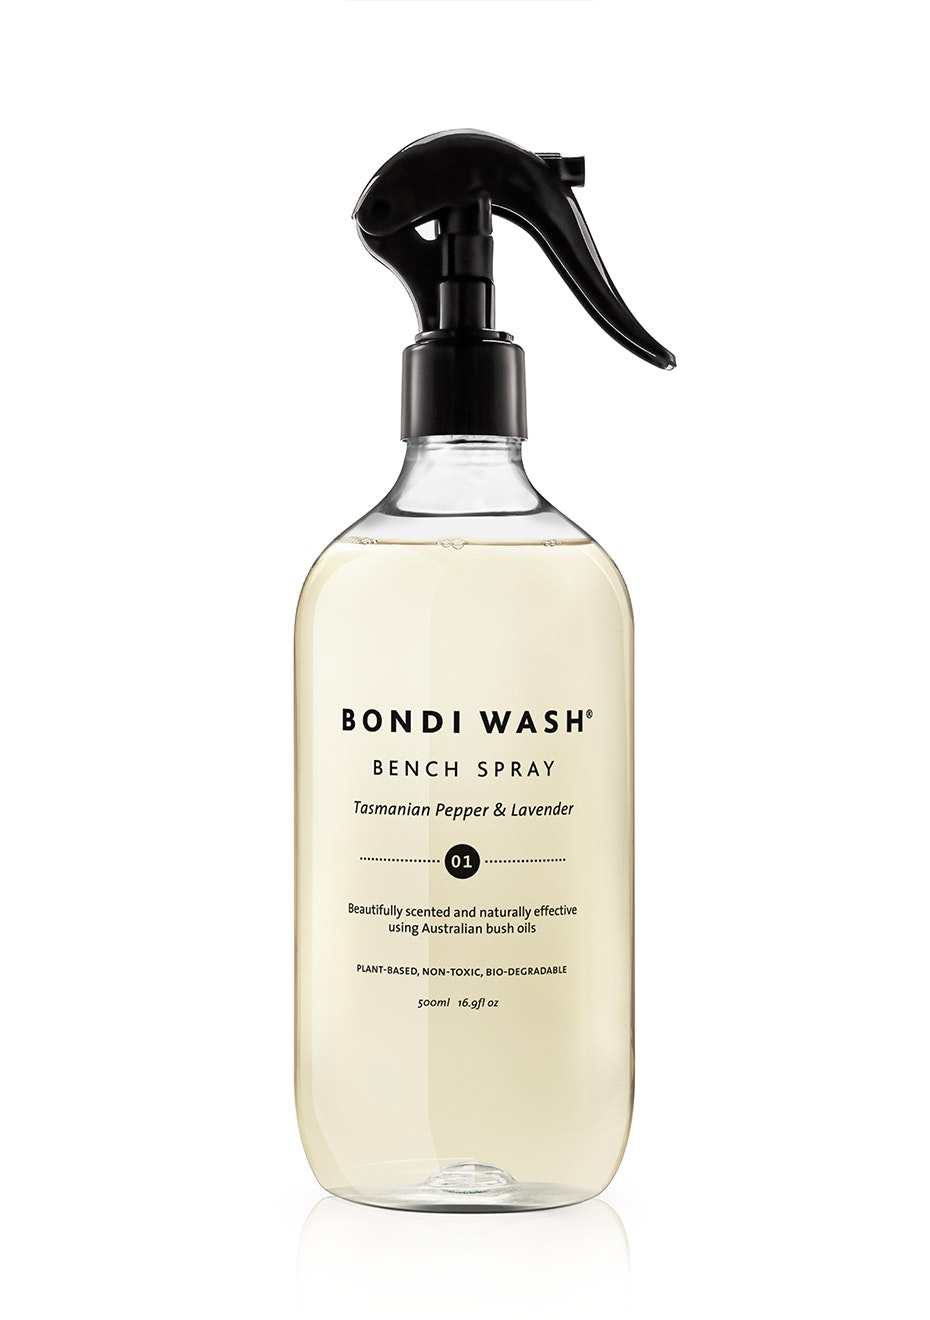 Bondi Wash - Bench Spray Tasmanian Pepper & Lavender 500ml